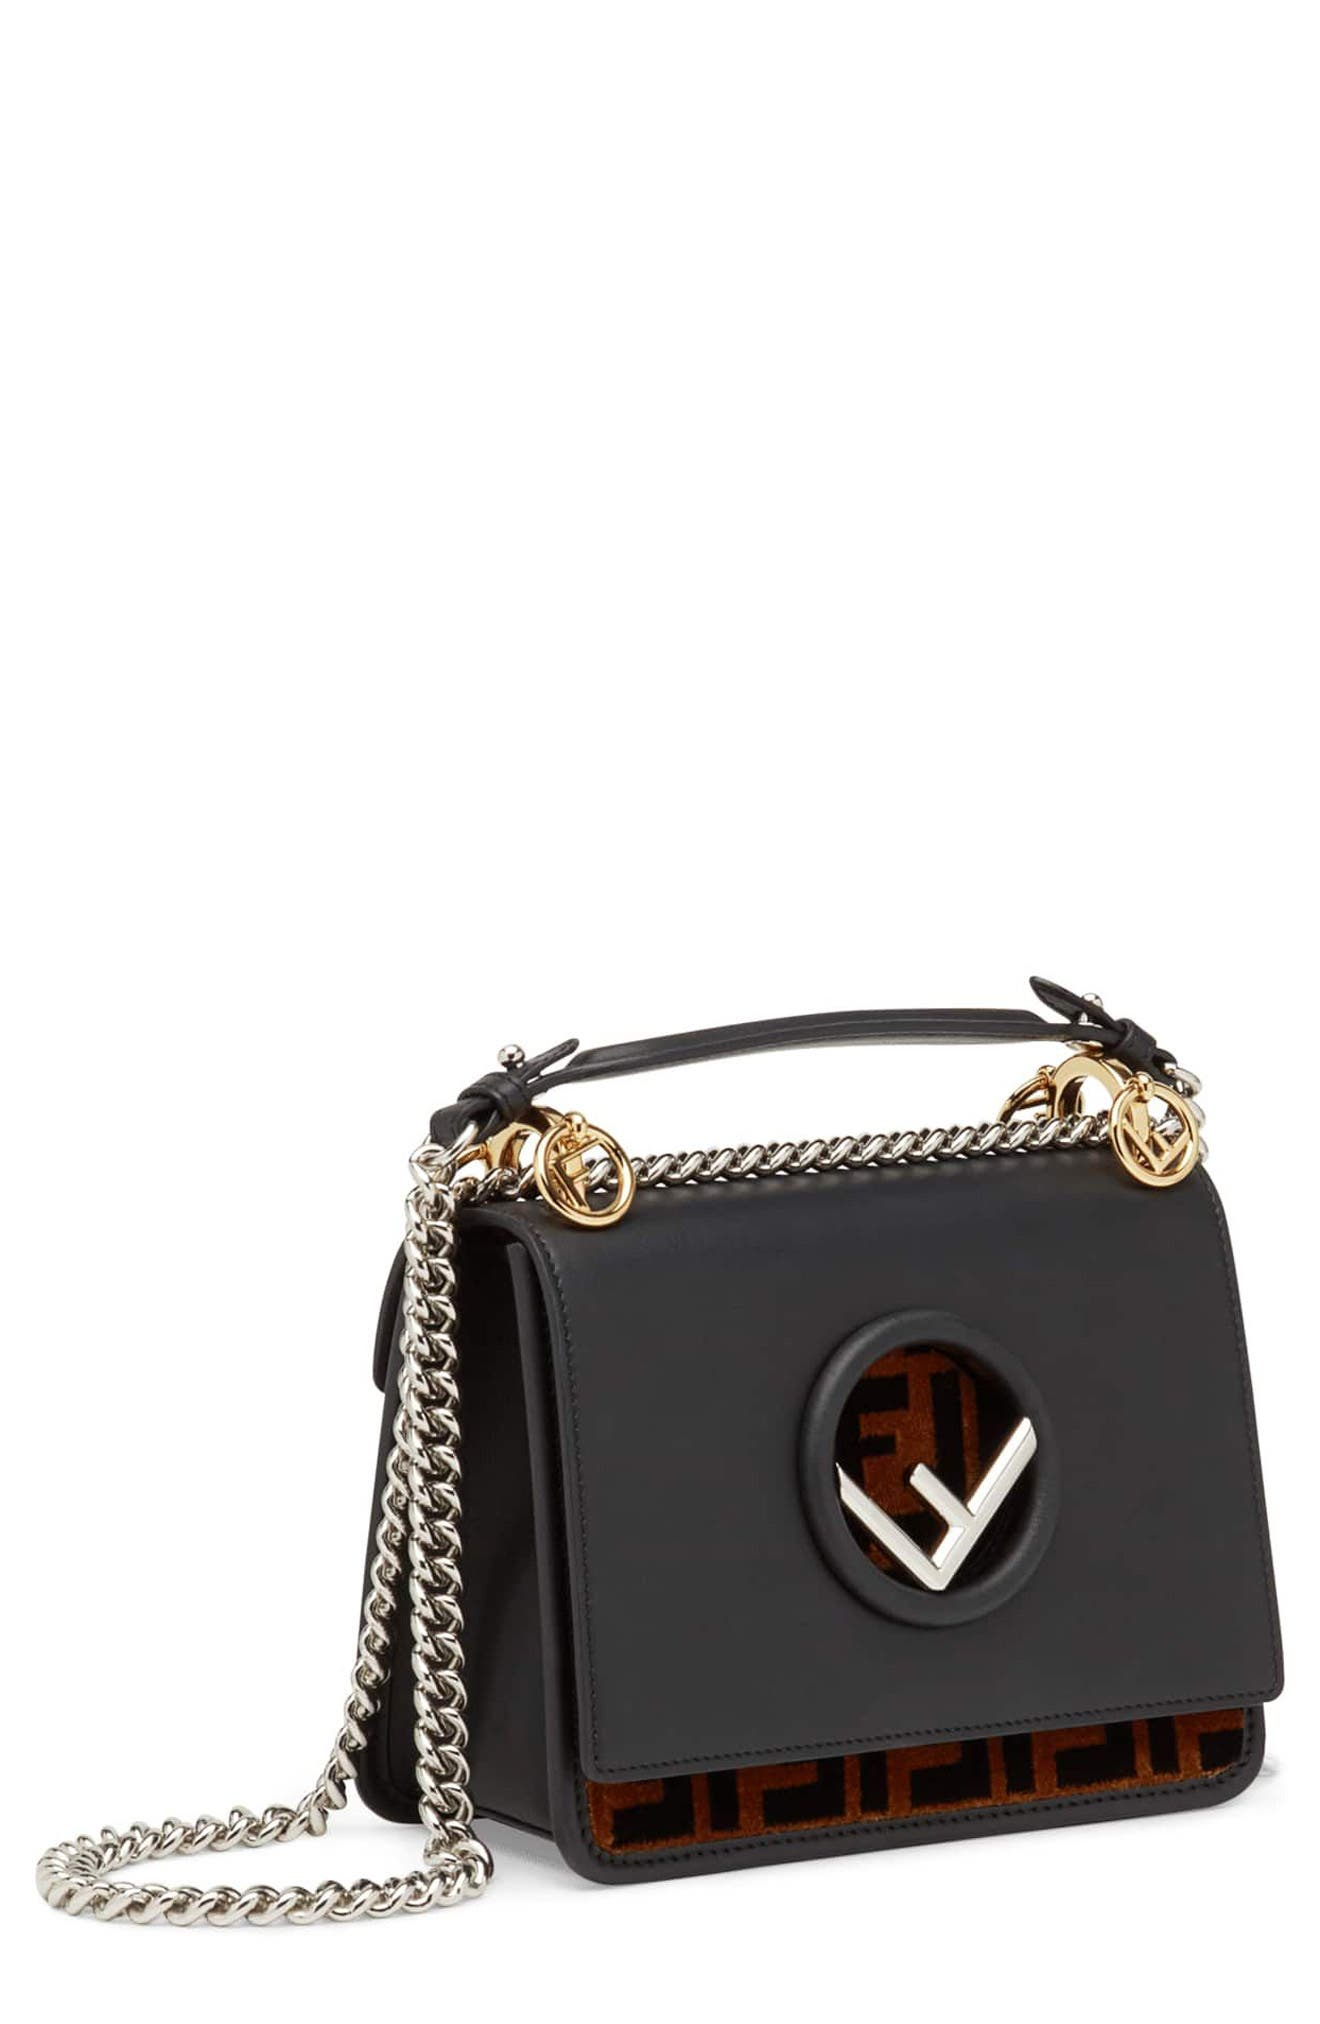 Small Kan I Logo Leather Shoulder Bag,                             Alternate thumbnail 4, color,                             Nero/ Tobacco/ Palladio